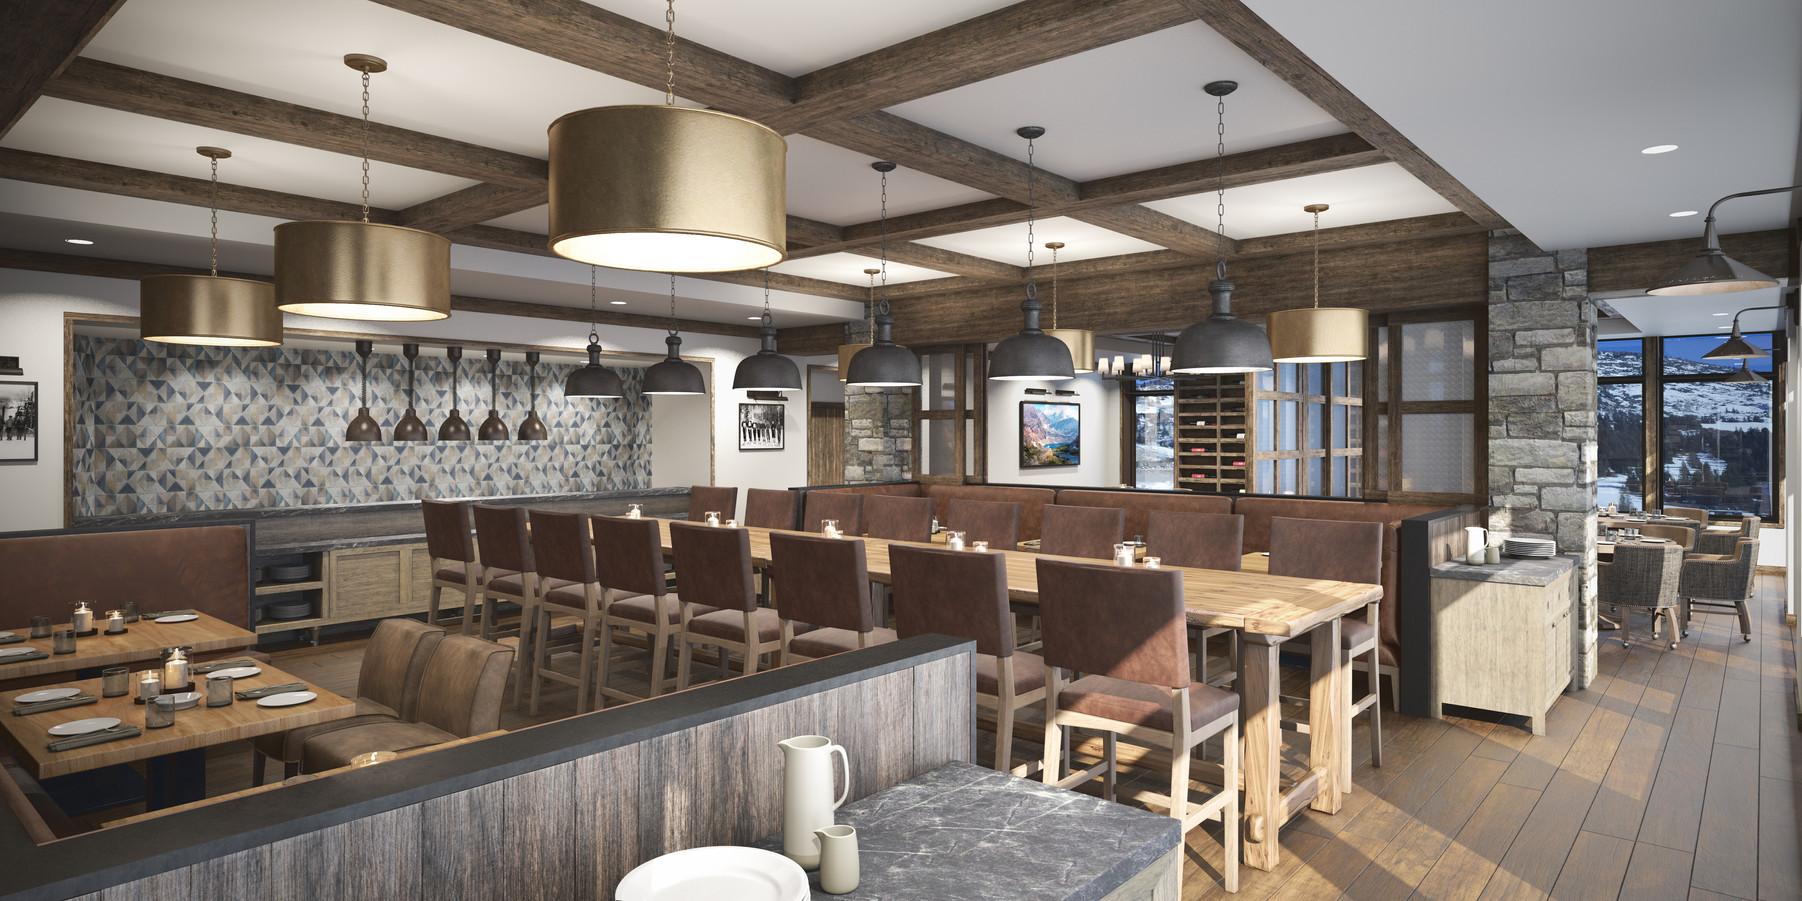 The Snowpine Lodge Restaurant